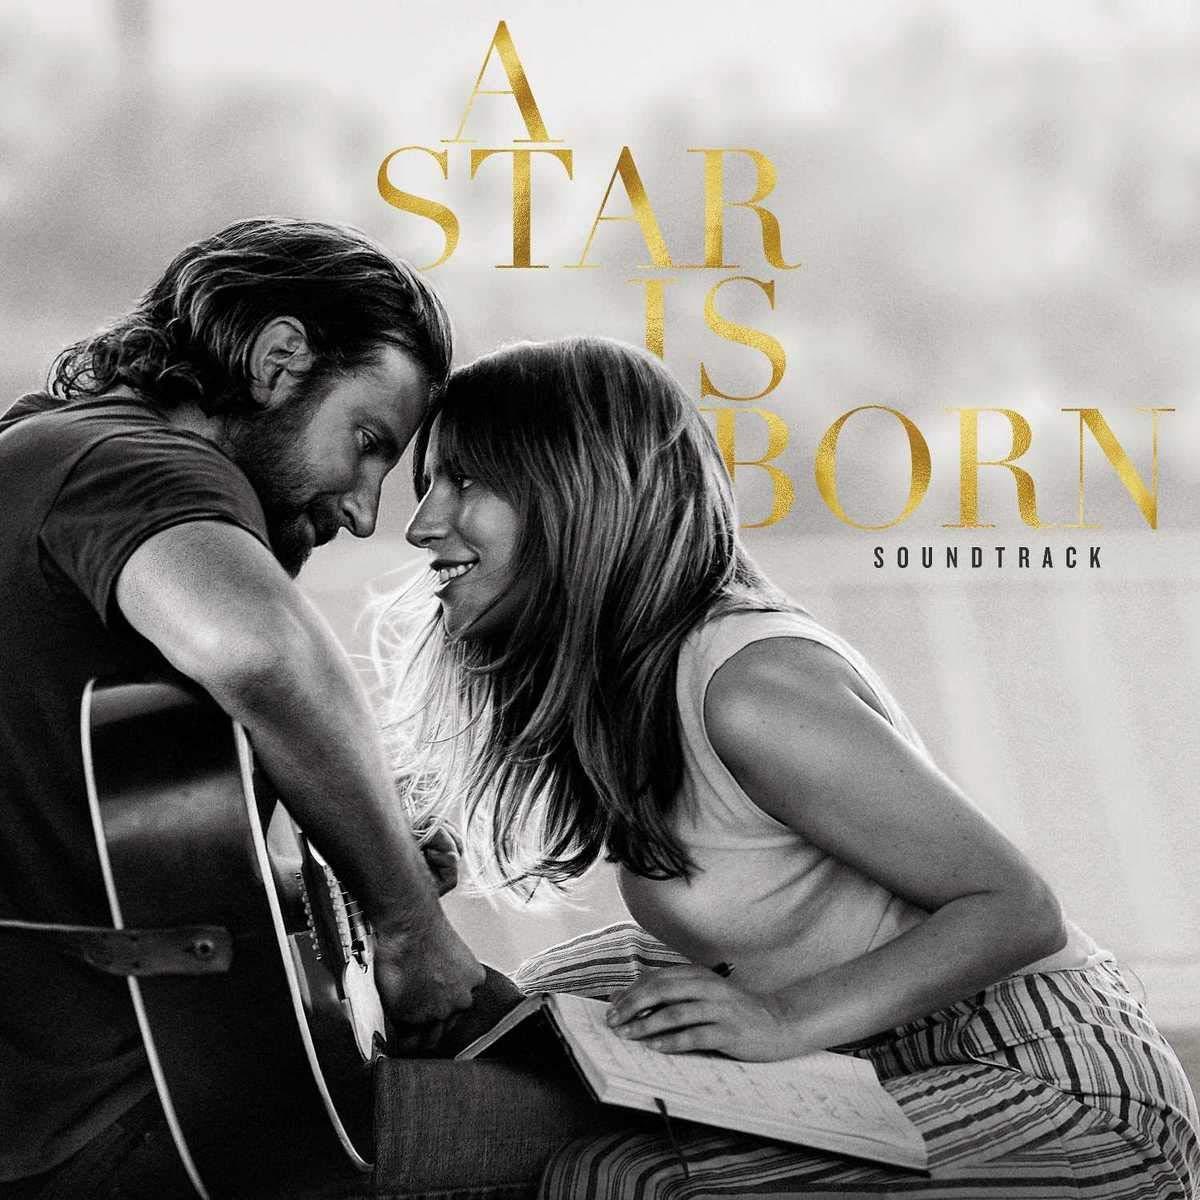 Lady Gaga,Бредли Купер Lady Gaga, Bradley Cooper. A Star Is Born. Original Motion Picture Soundtrack lady gaga lady gaga the remix